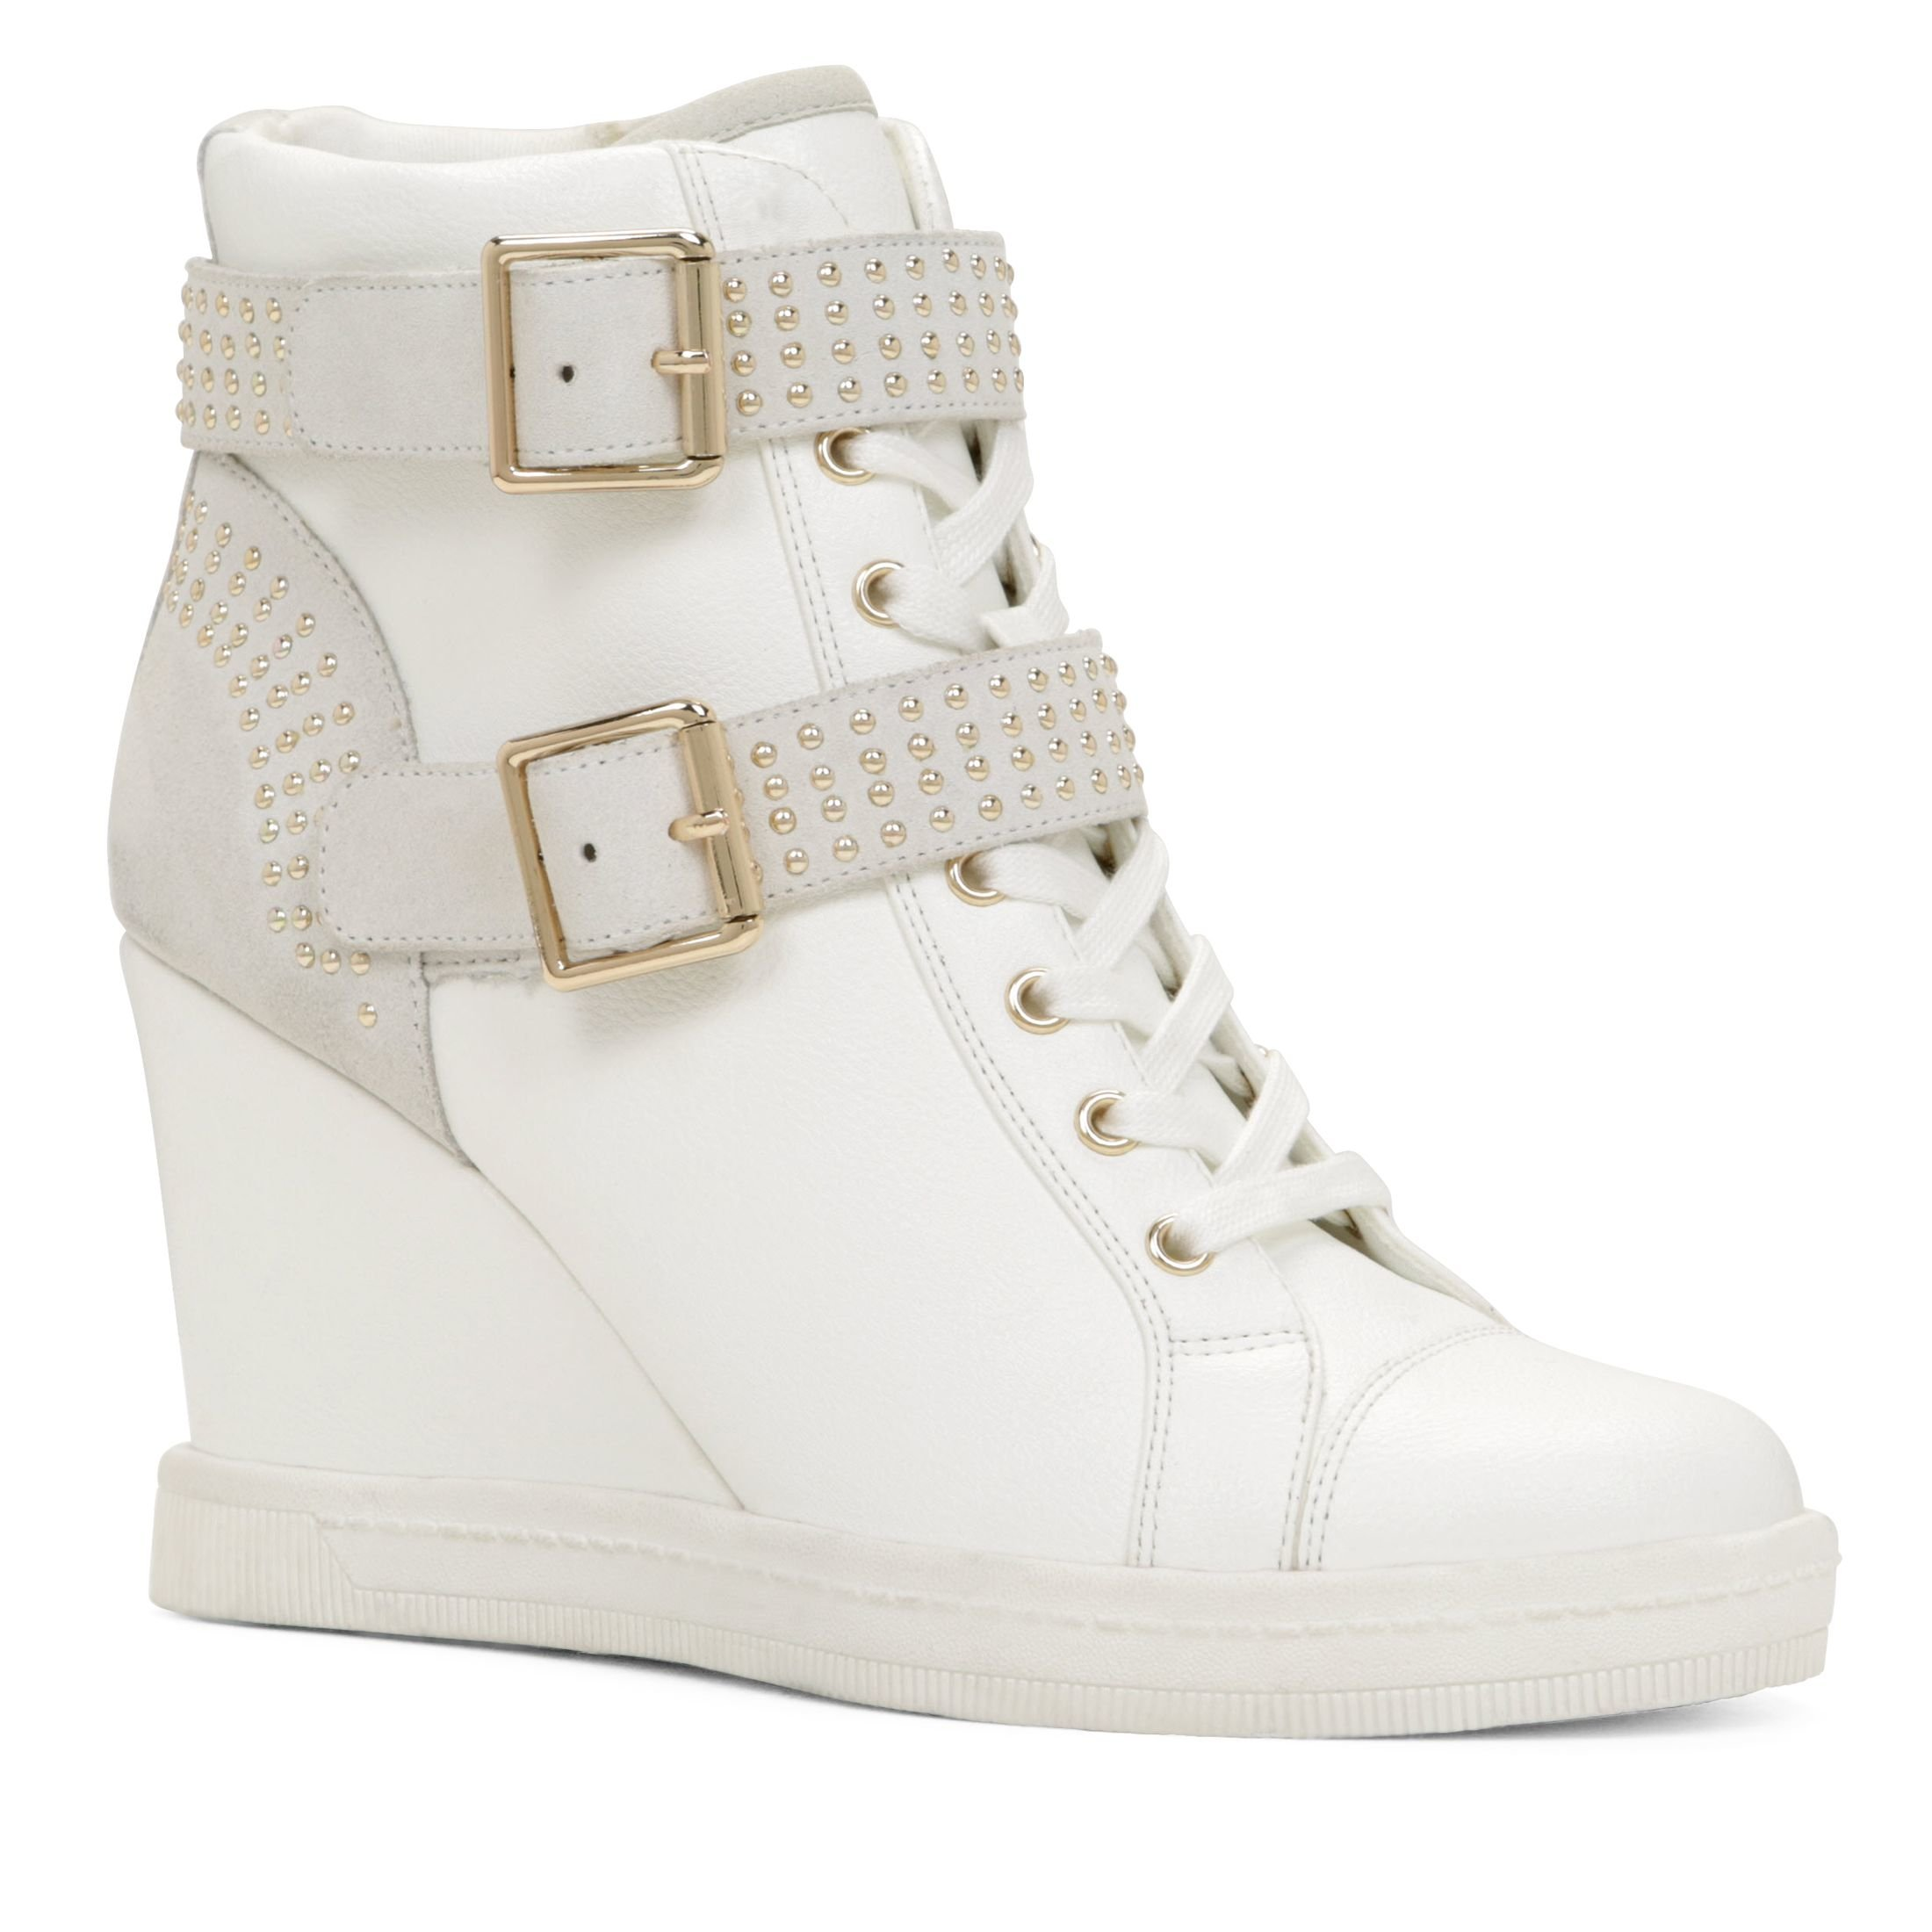 aldo verratti studded sneaker wedges in white lyst